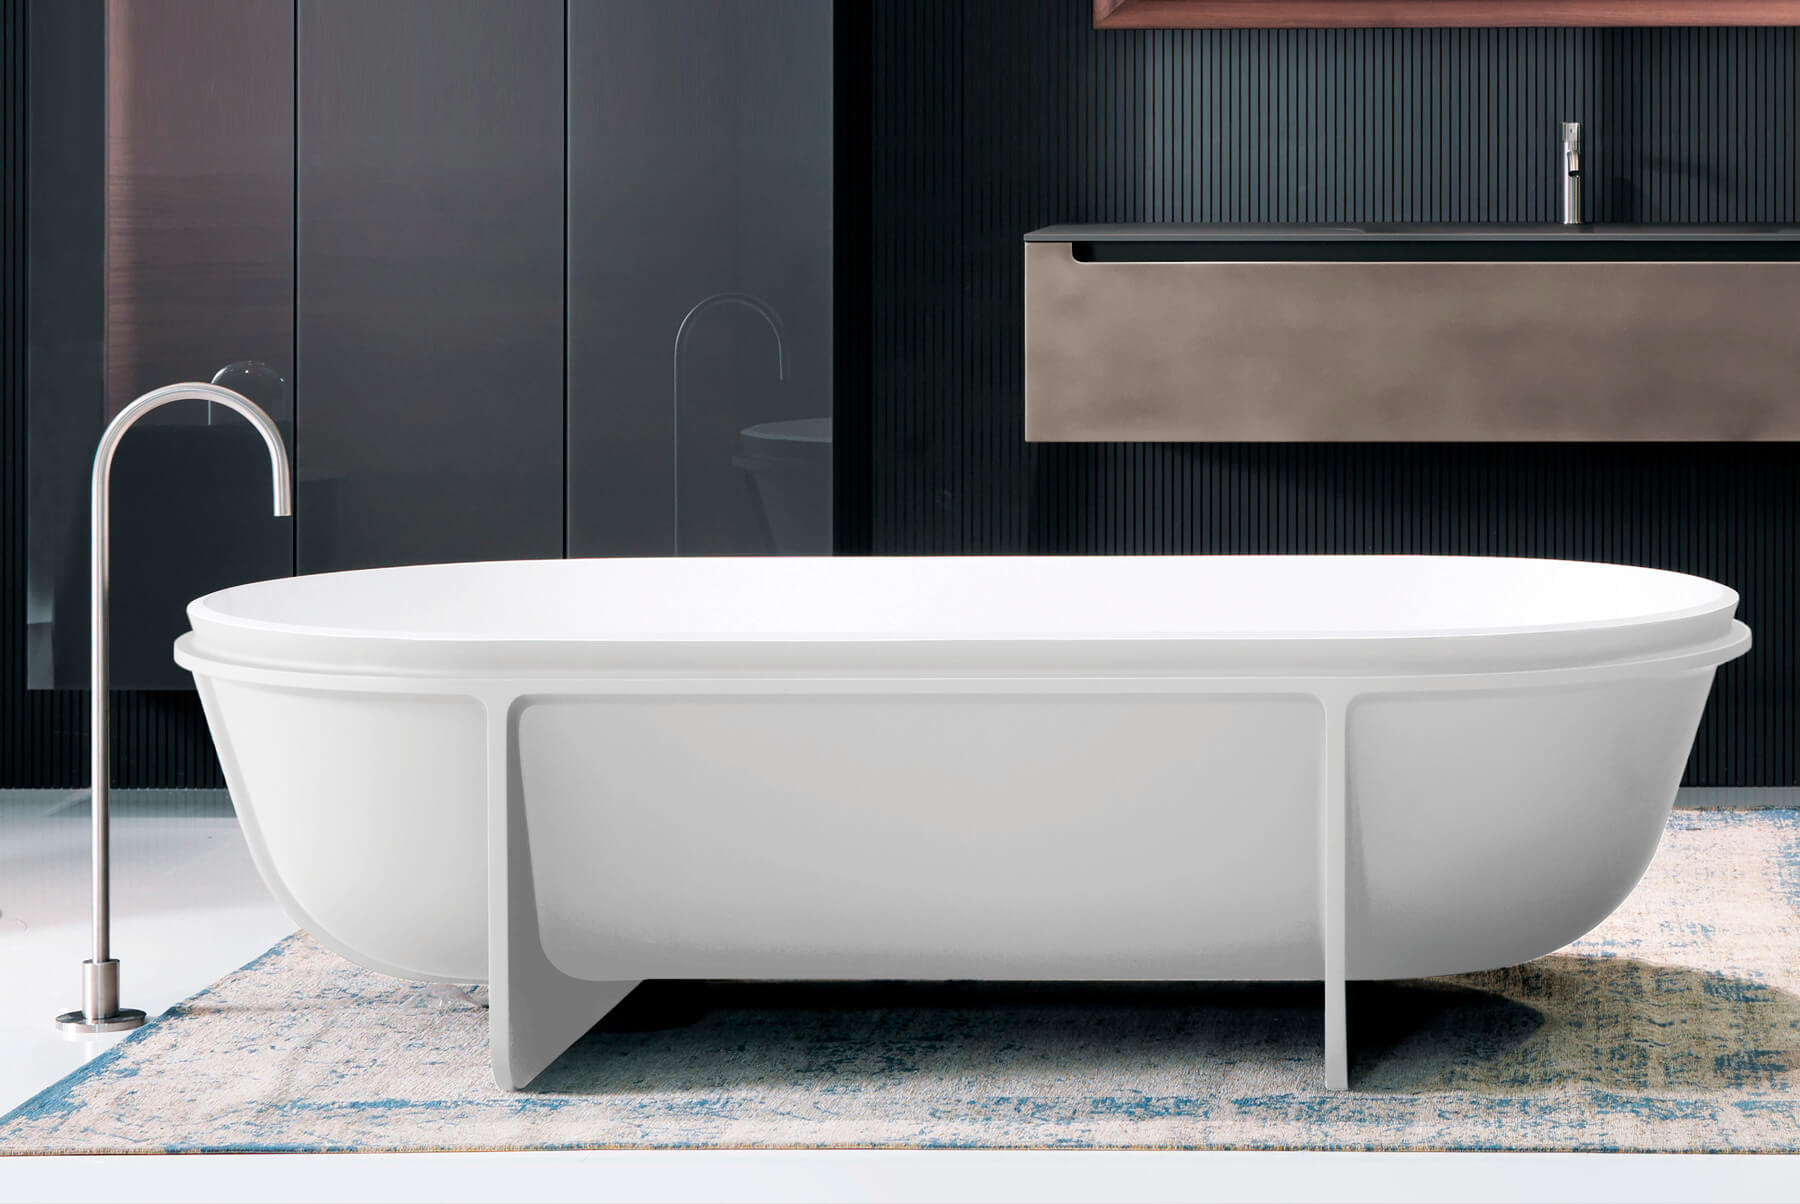 Bath-Tubs-Falper-Controstampo-white-side-1800x1204